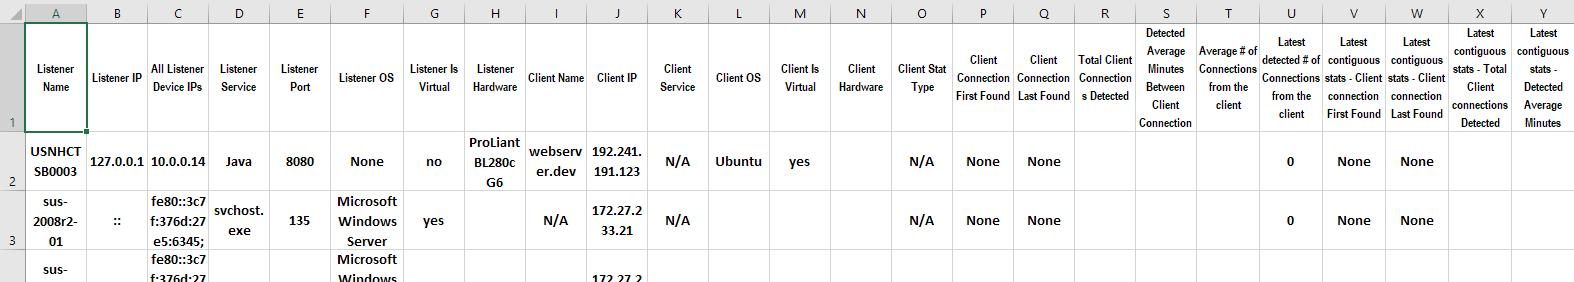 service dependencies report sample